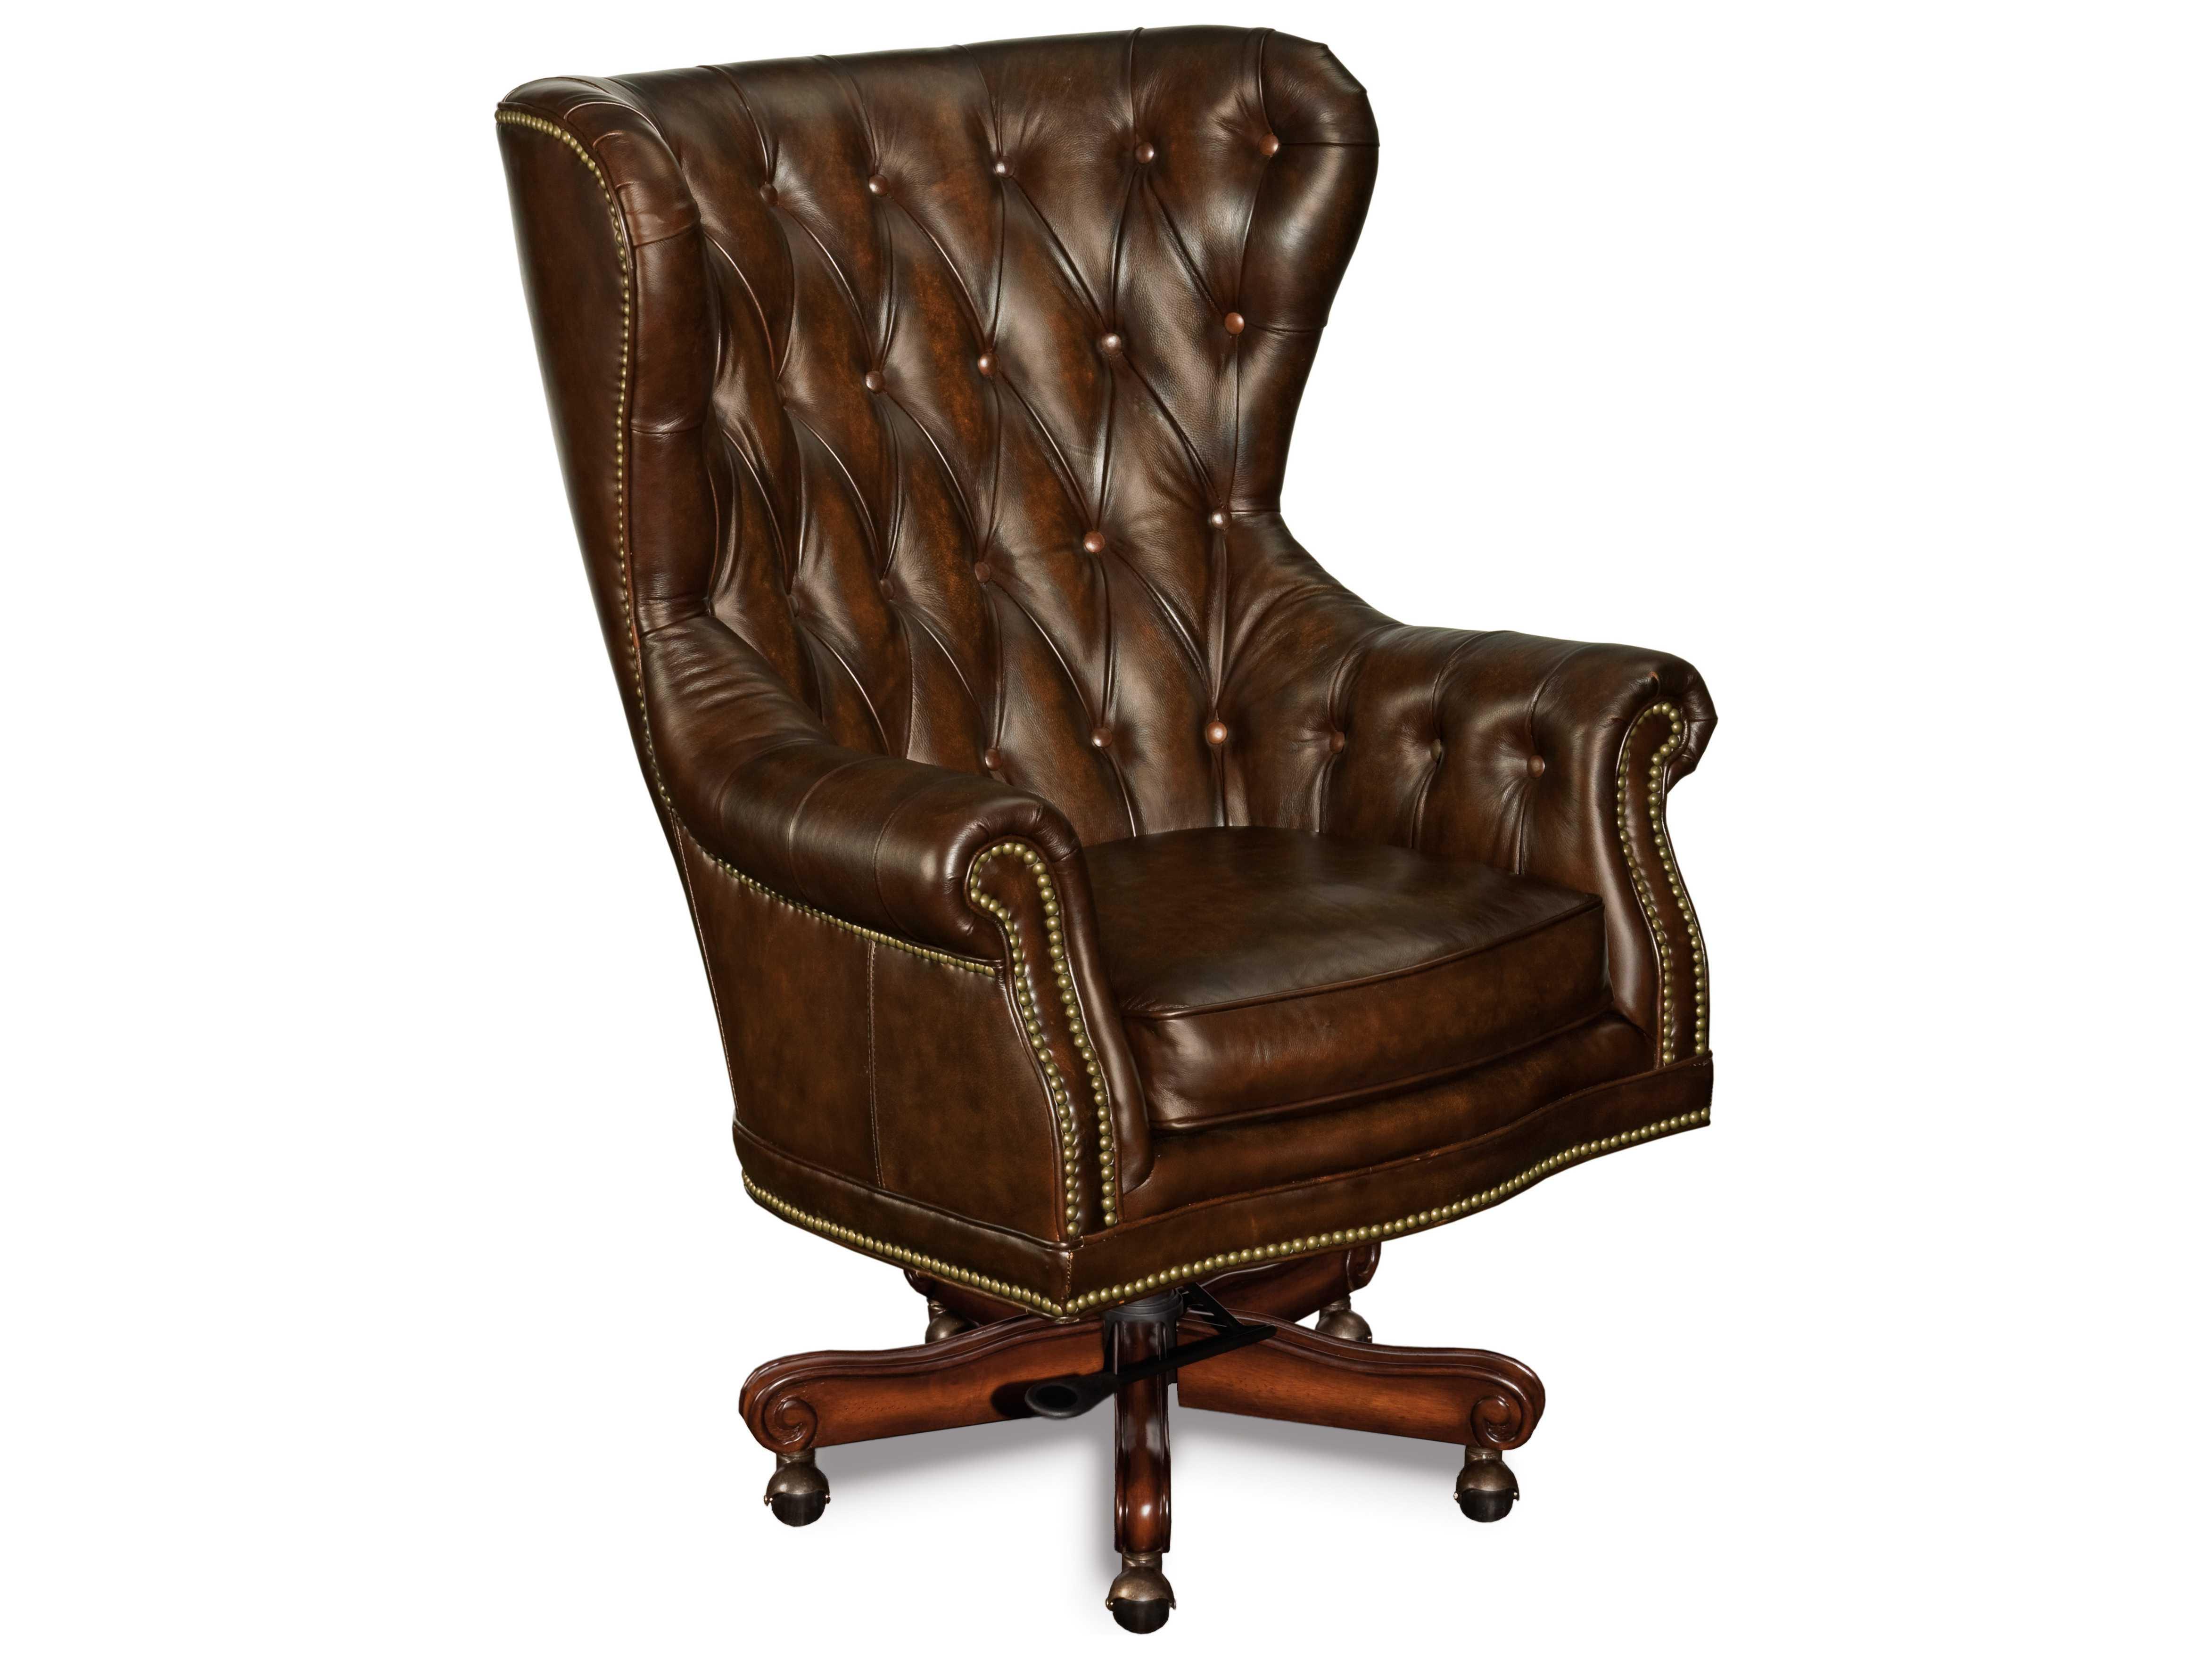 Hooker Furniture Sedona Grand Piano Dark Wood Executive Swivel Chair